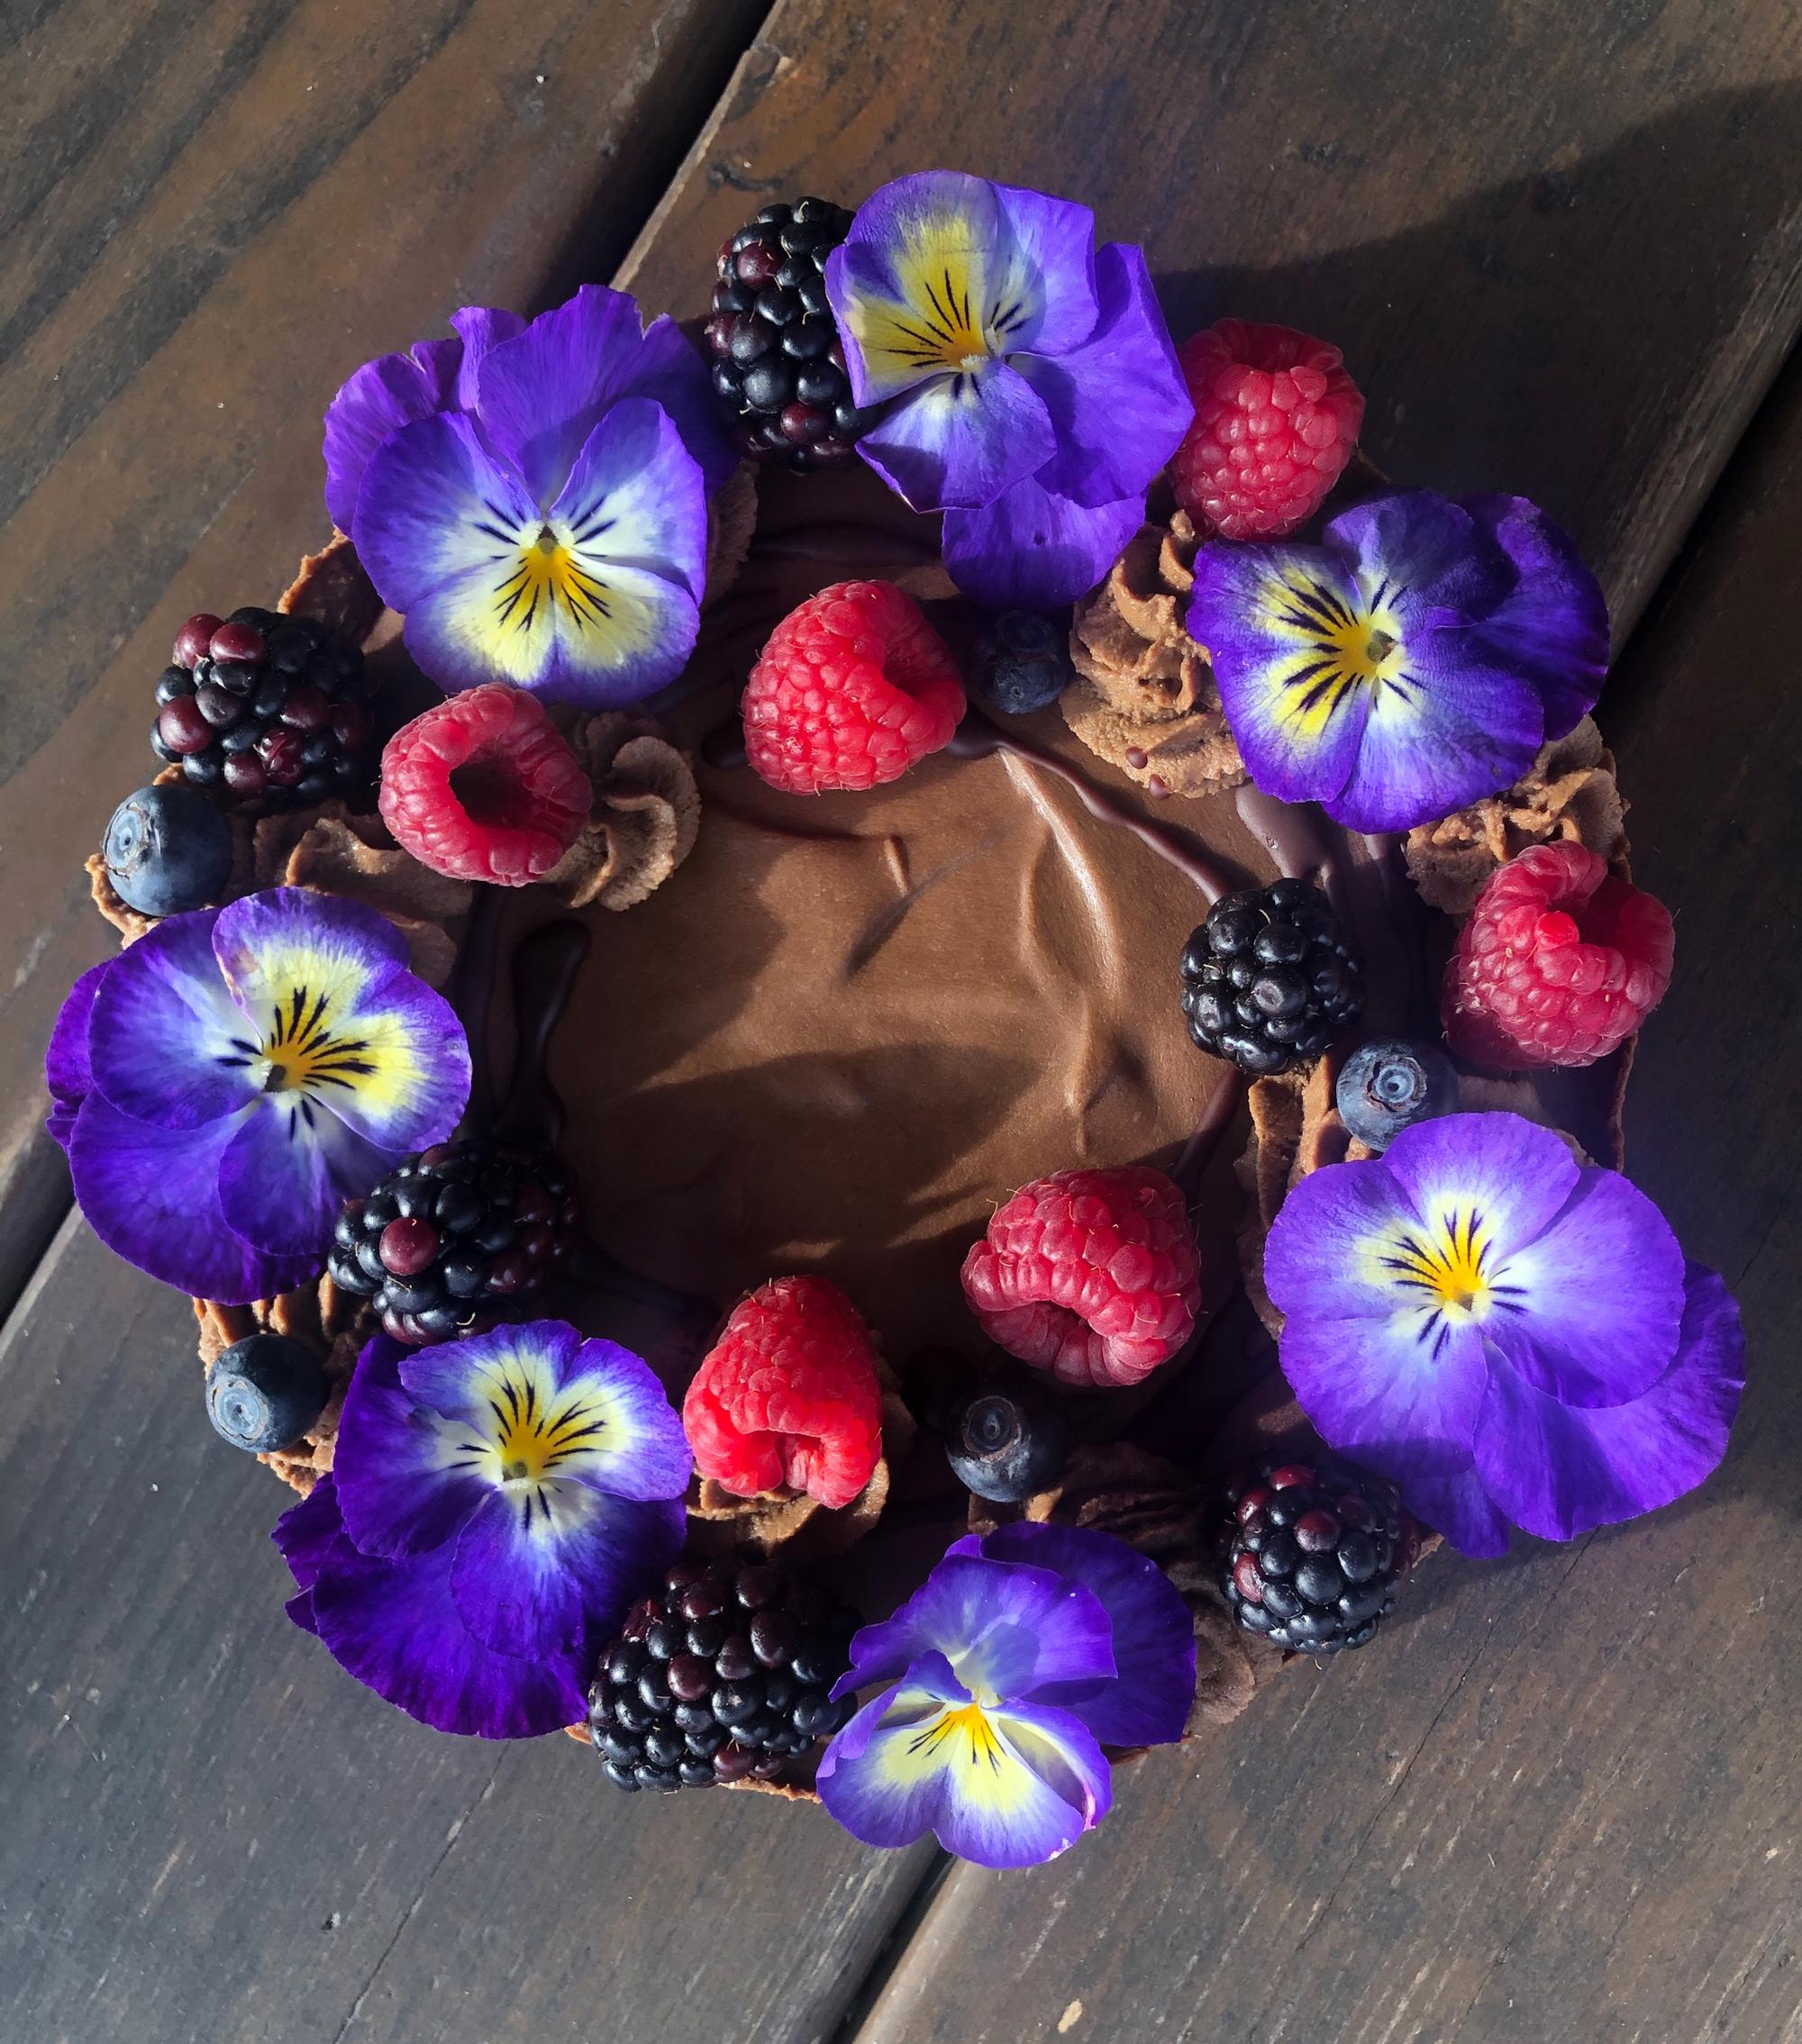 Čokoládová torta s jedlými kvetmi